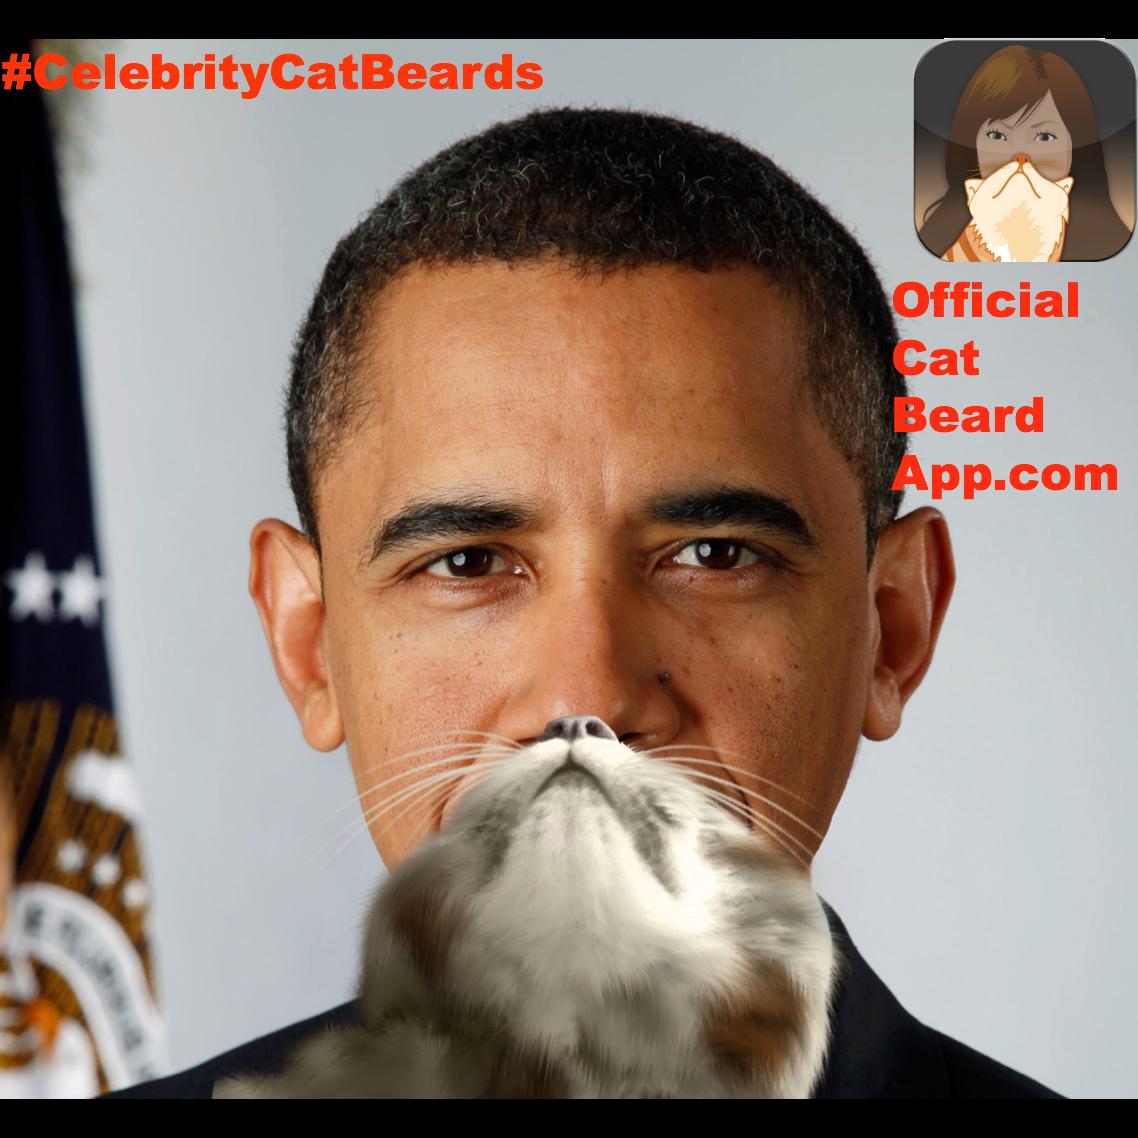 Obama beard